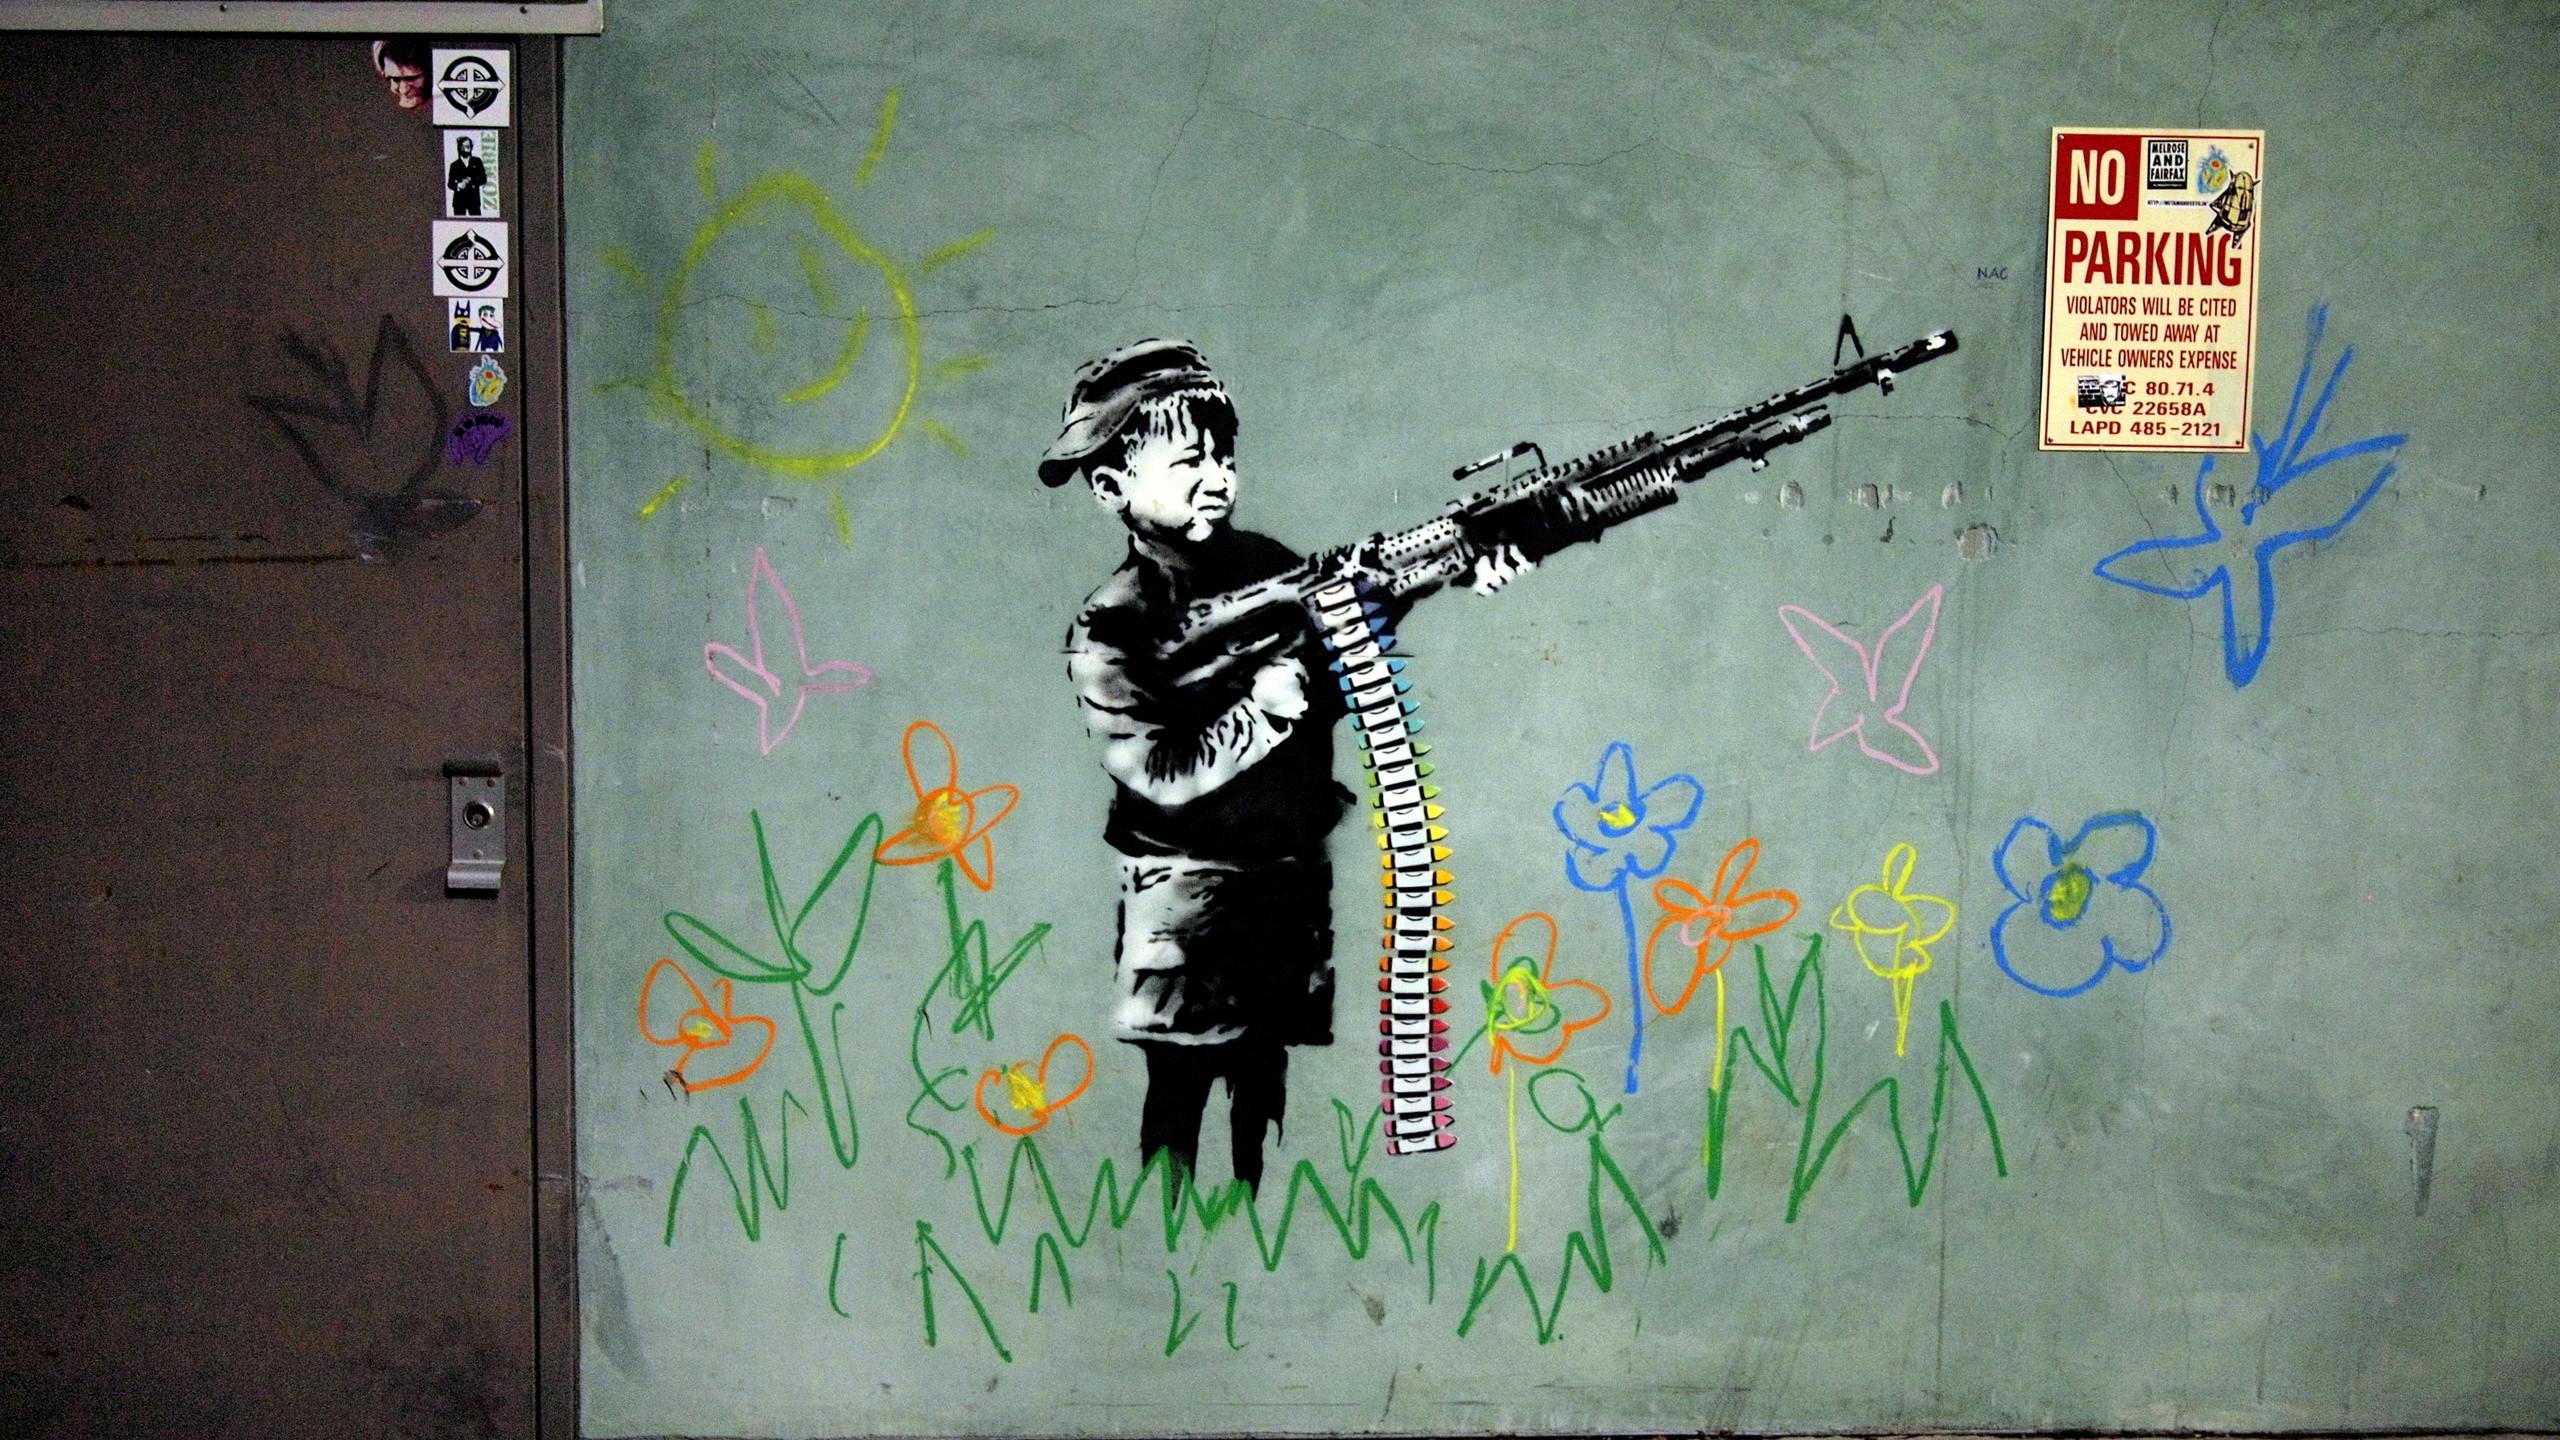 Banksy Crayola Shooter No Parking, Banksy, Street Art, Streetart, Graffit,  Wall